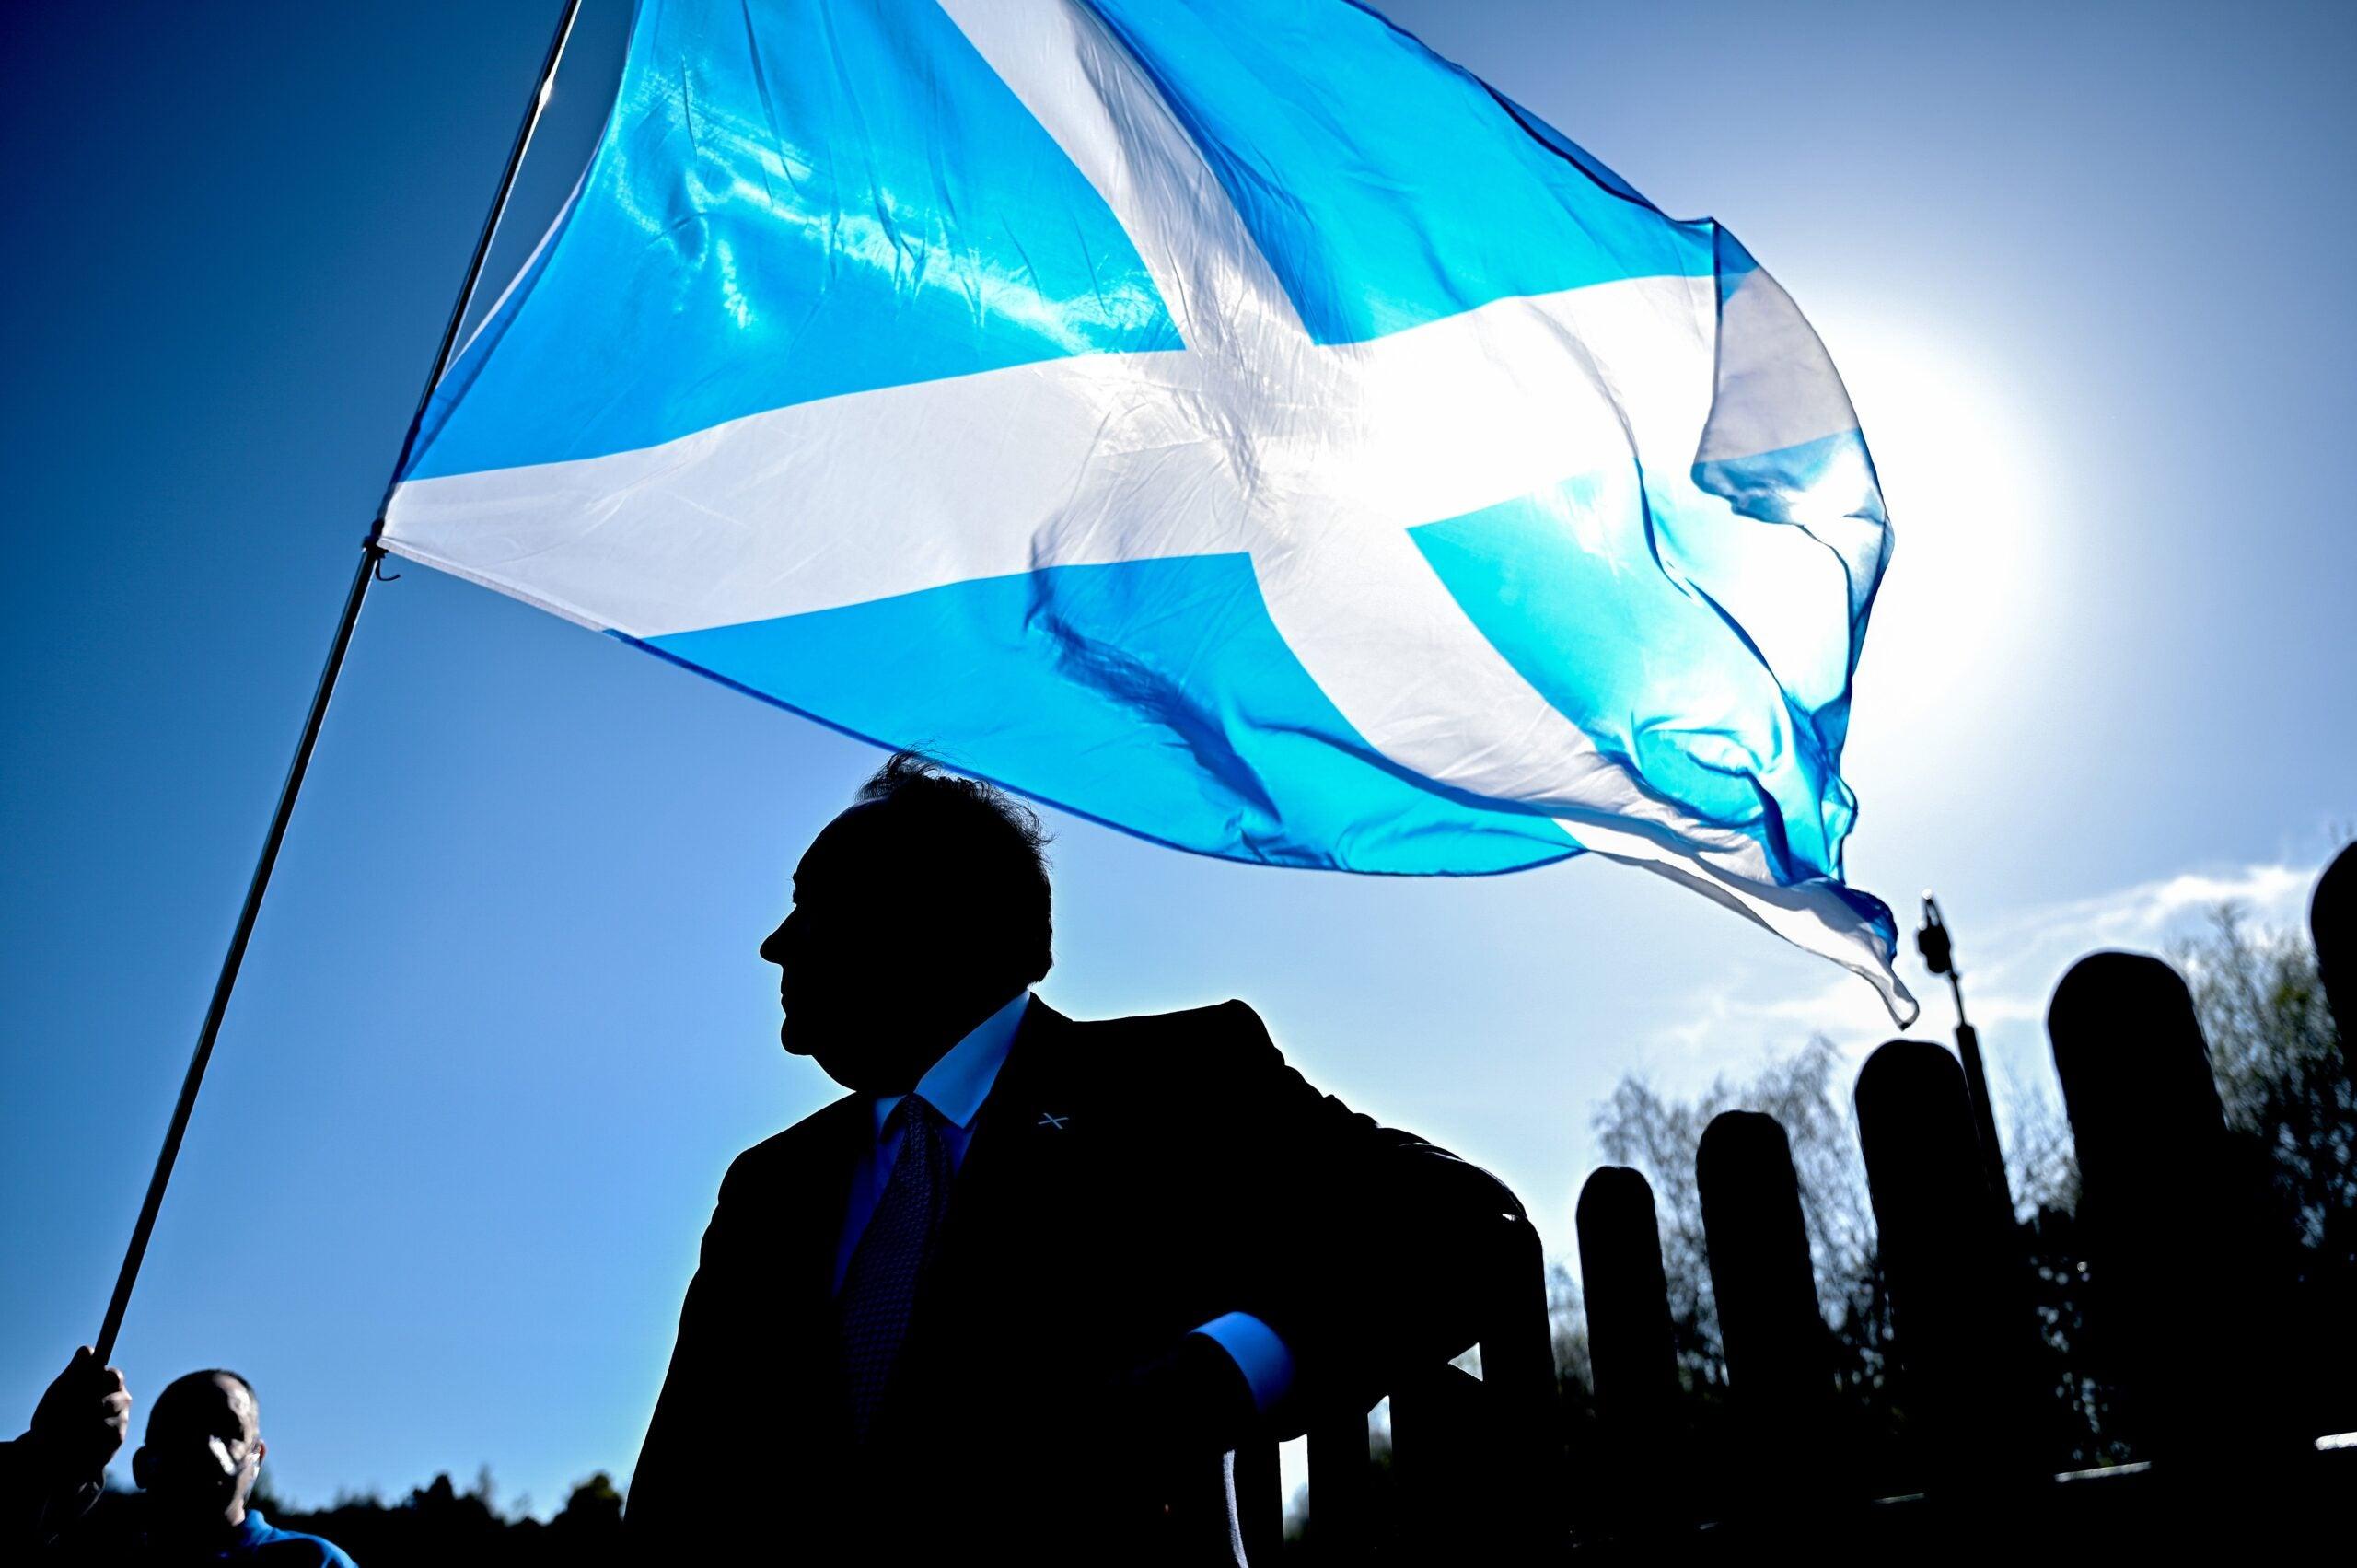 How Alex Salmond's Alba Party reveals England and Scotland's shared ideals